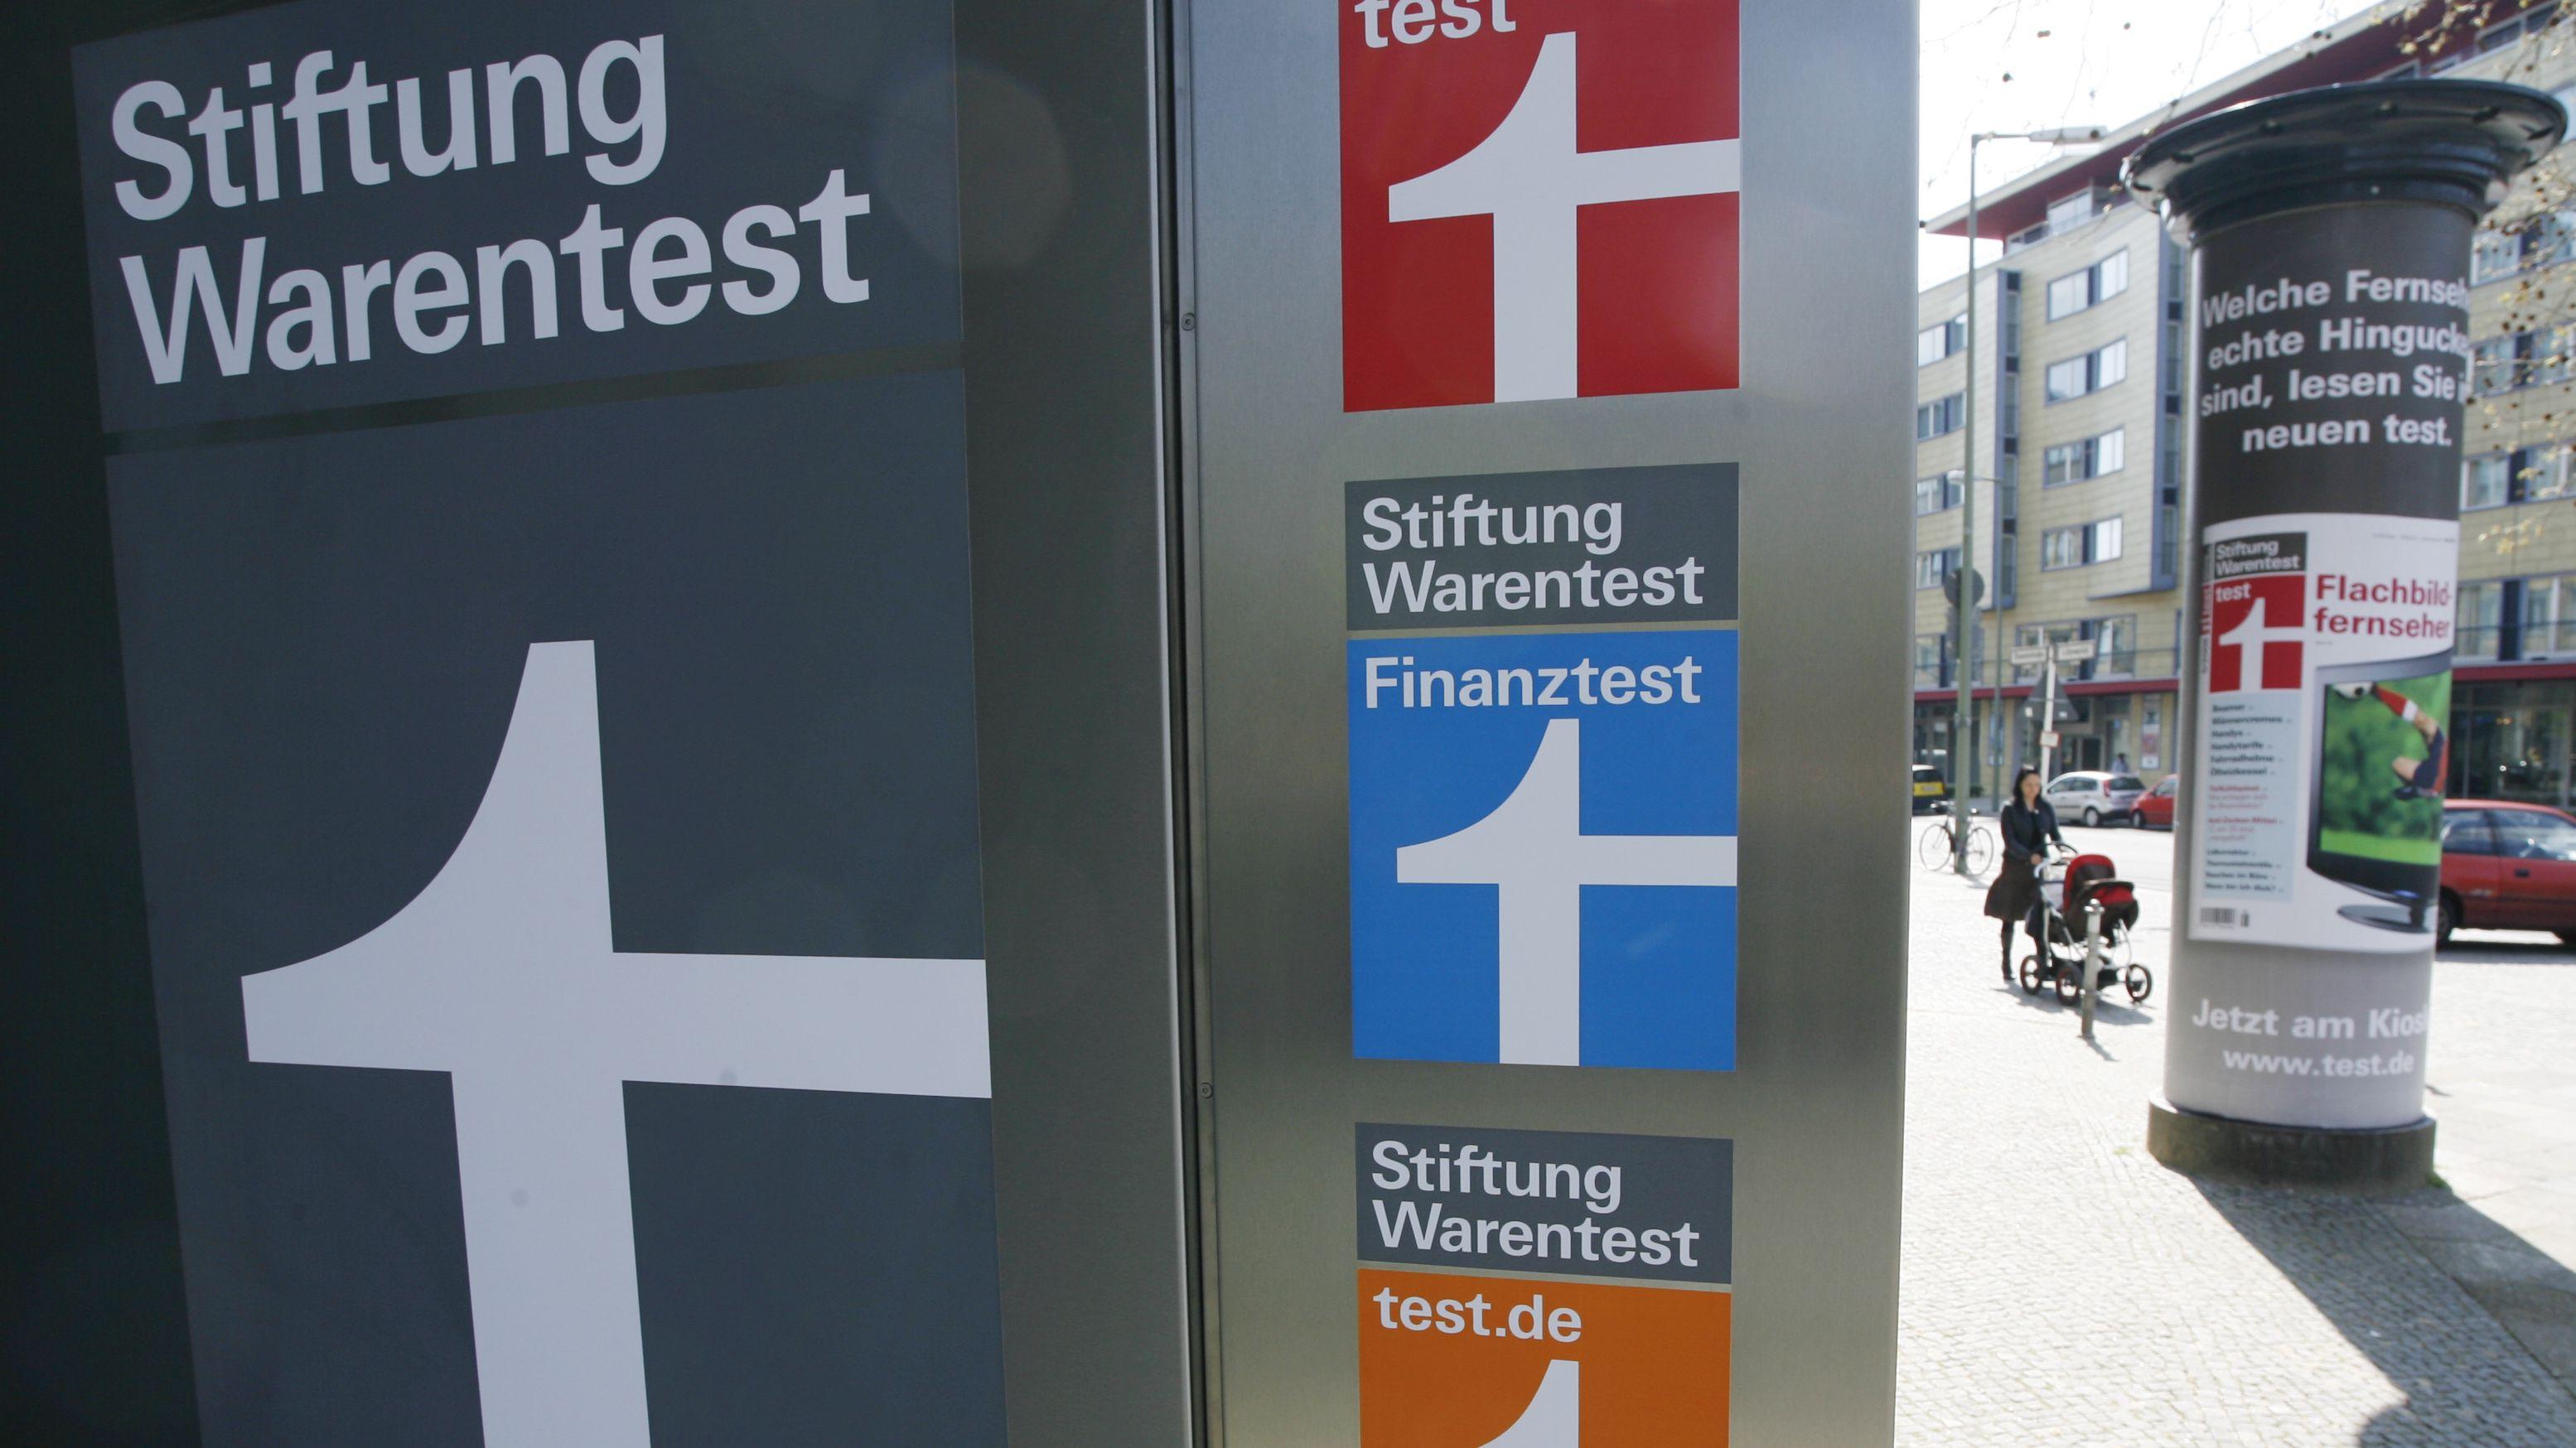 Logos am Eingang zur Stiftung Warentest